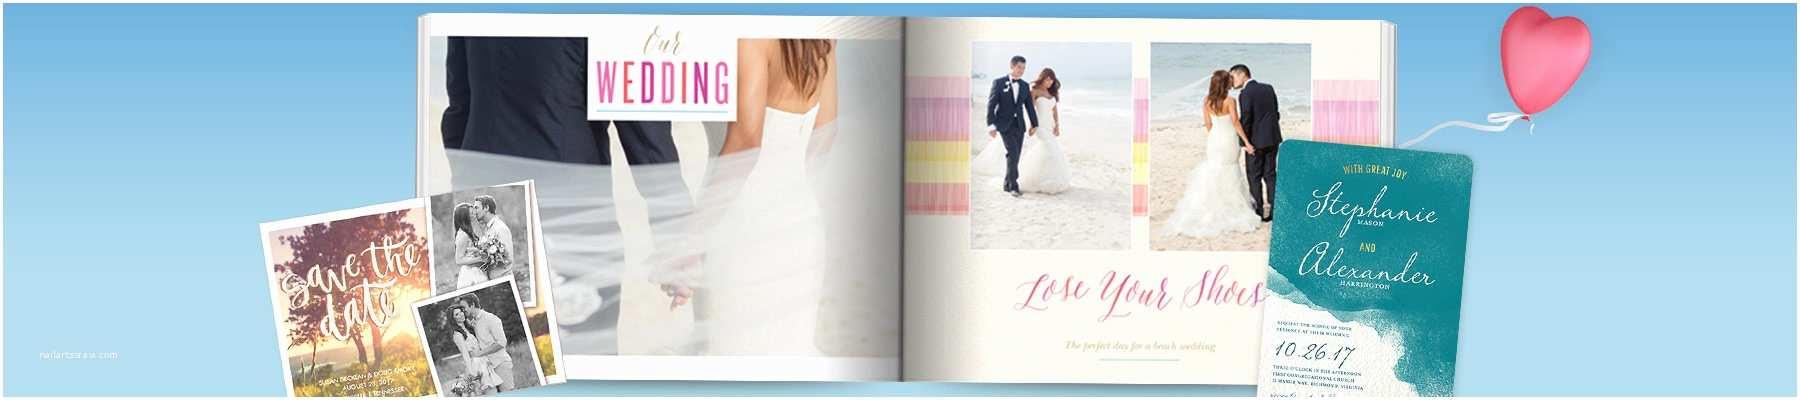 Shutterfly Beach Wedding Invitations Shutterfly Destination Wedding Inspiration Board